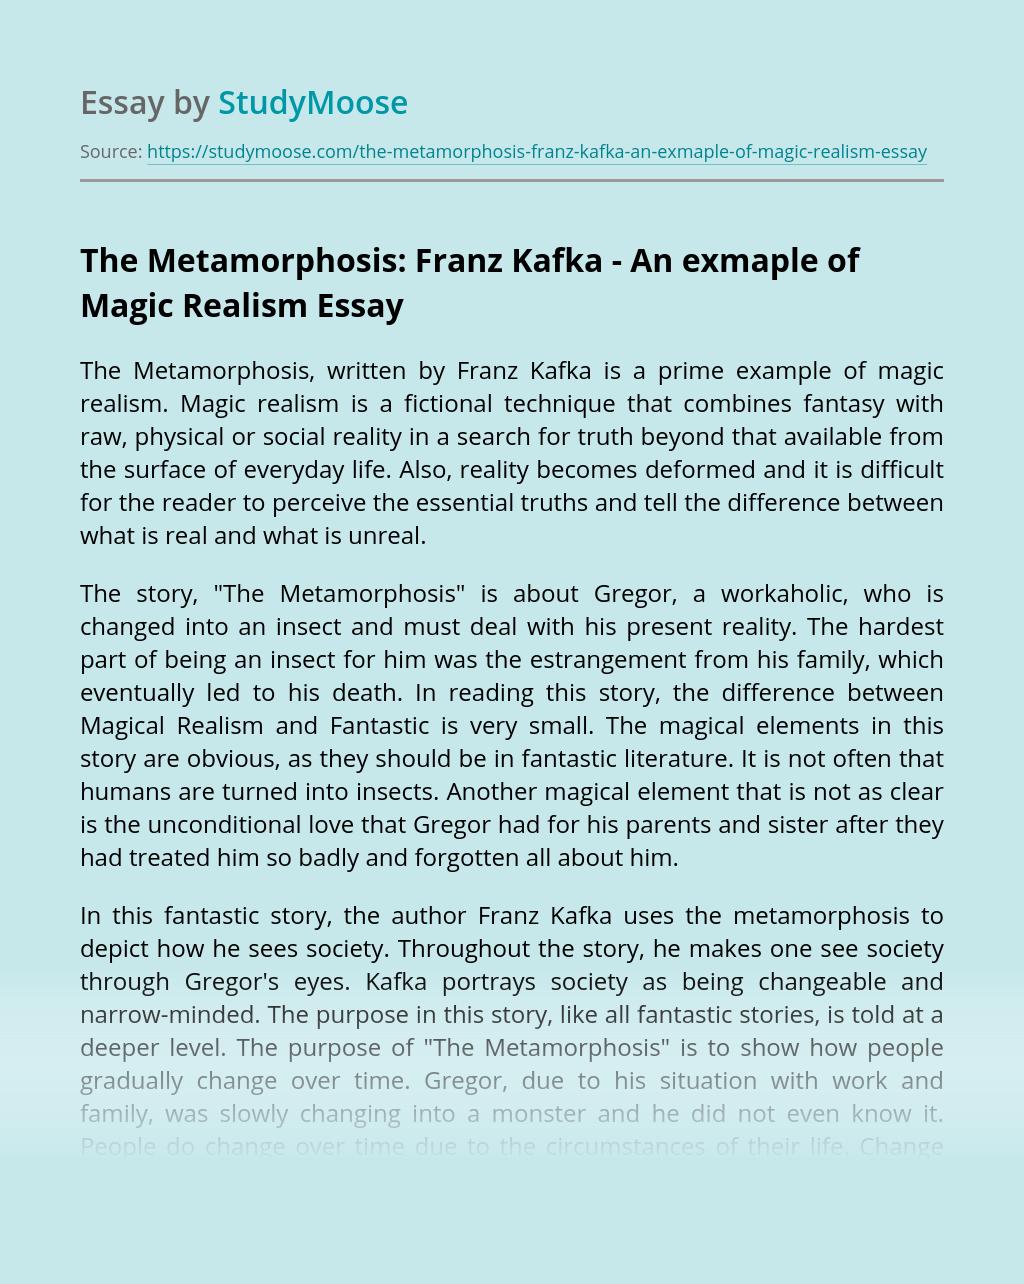 The Metamorphosis: Franz Kafka - An exmaple of Magic Realism